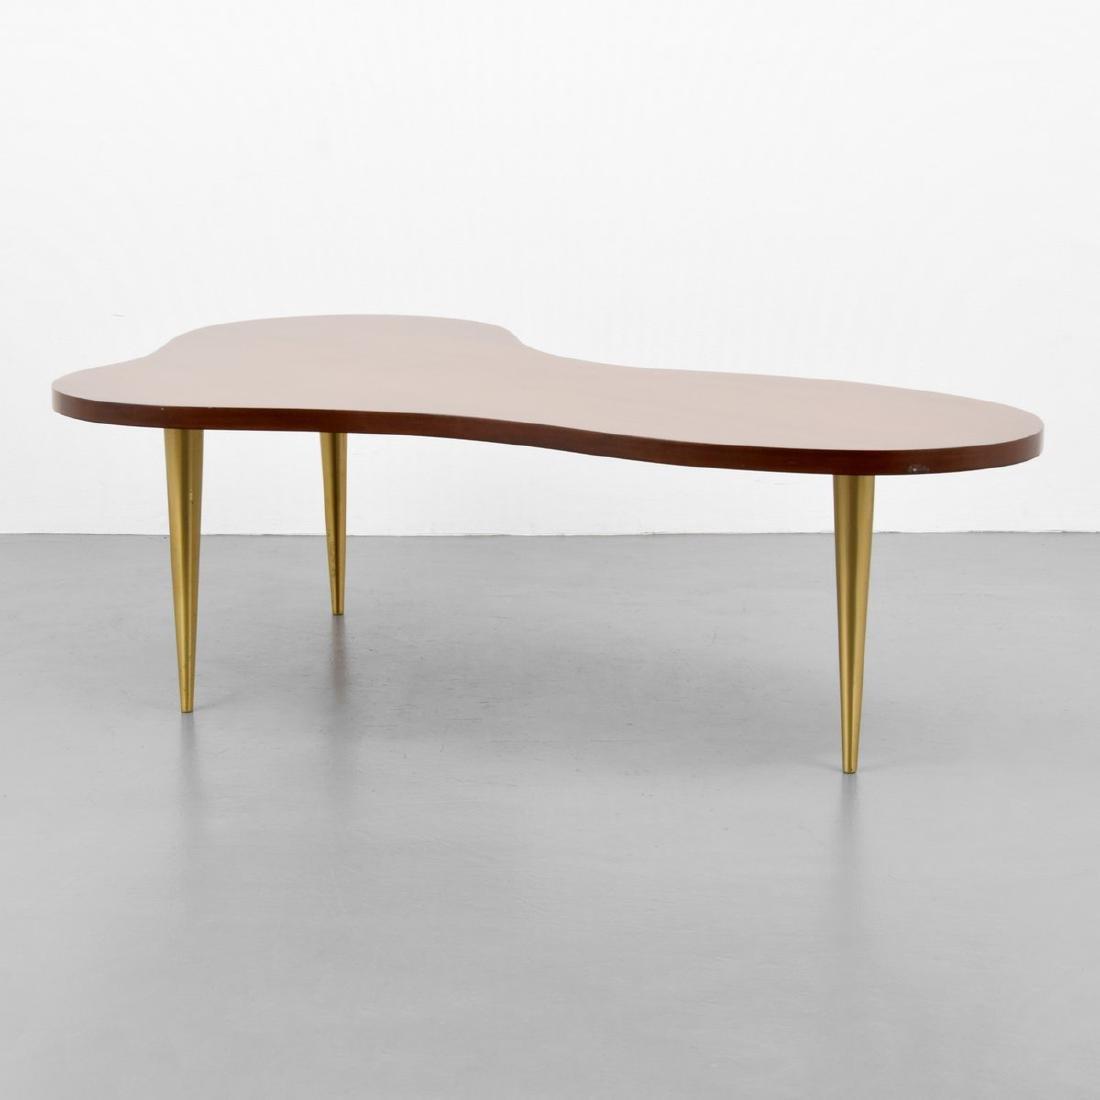 T.H. Robsjohn-Gibbings Biomorphic Coffee Table